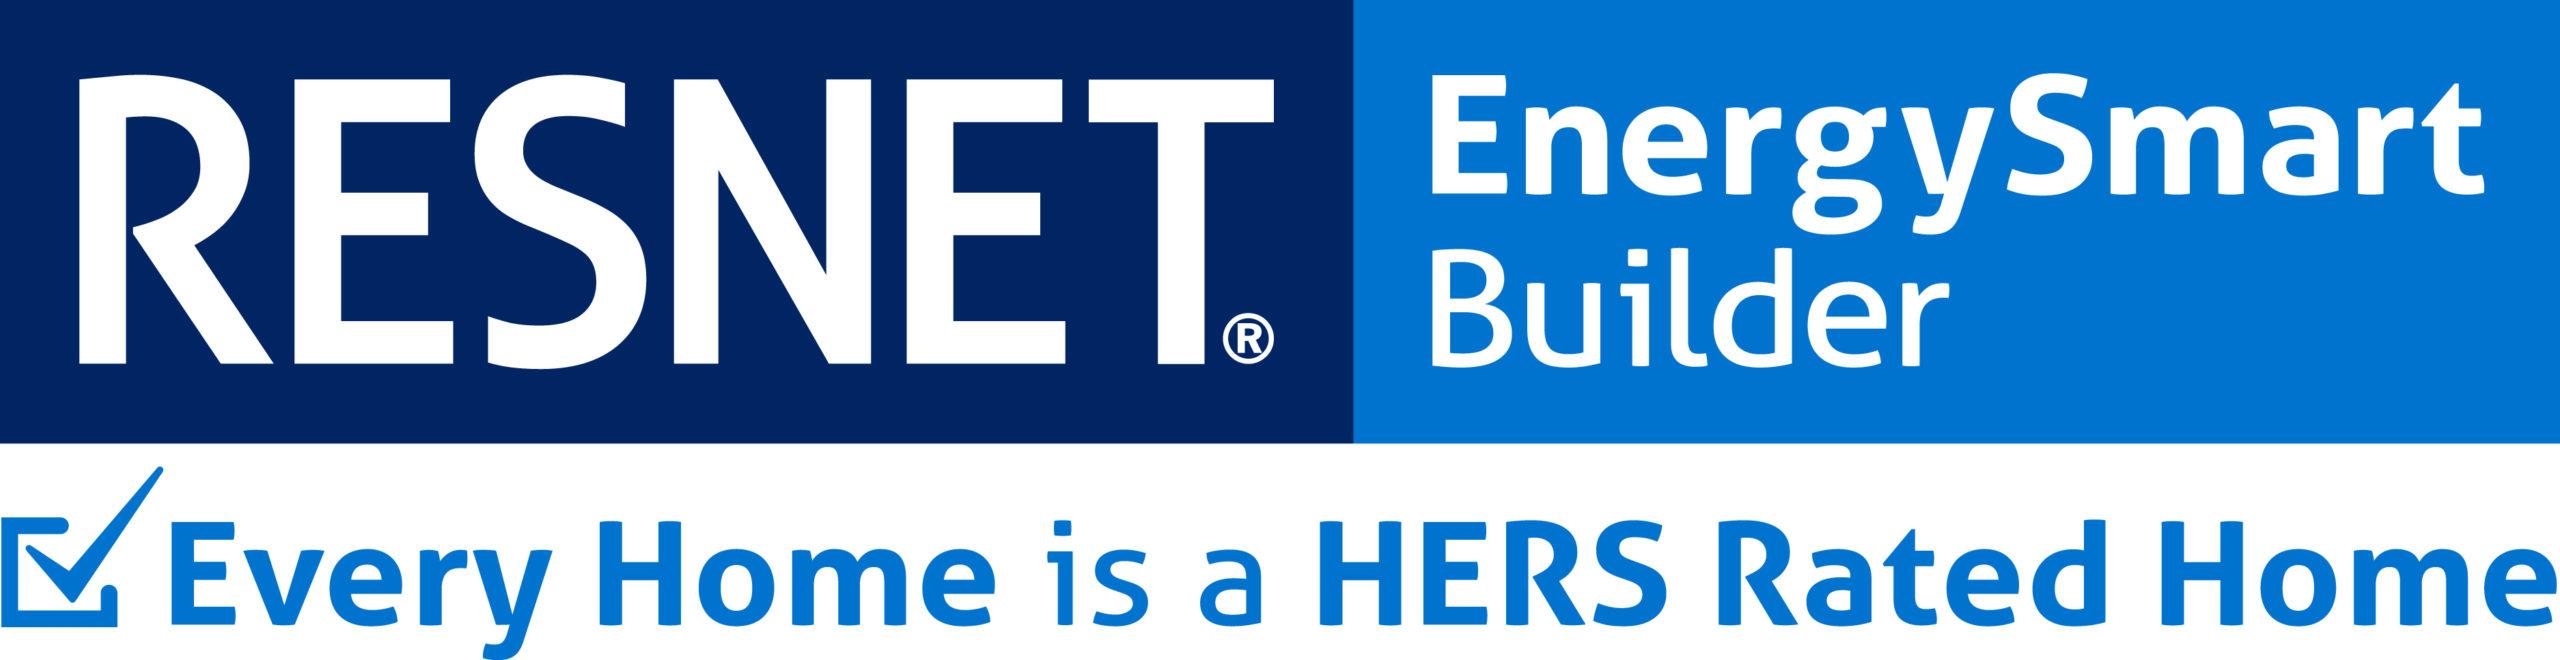 RESNET_EnergySmart_Builder_Horizontal_Logo_RGB_Web_Use